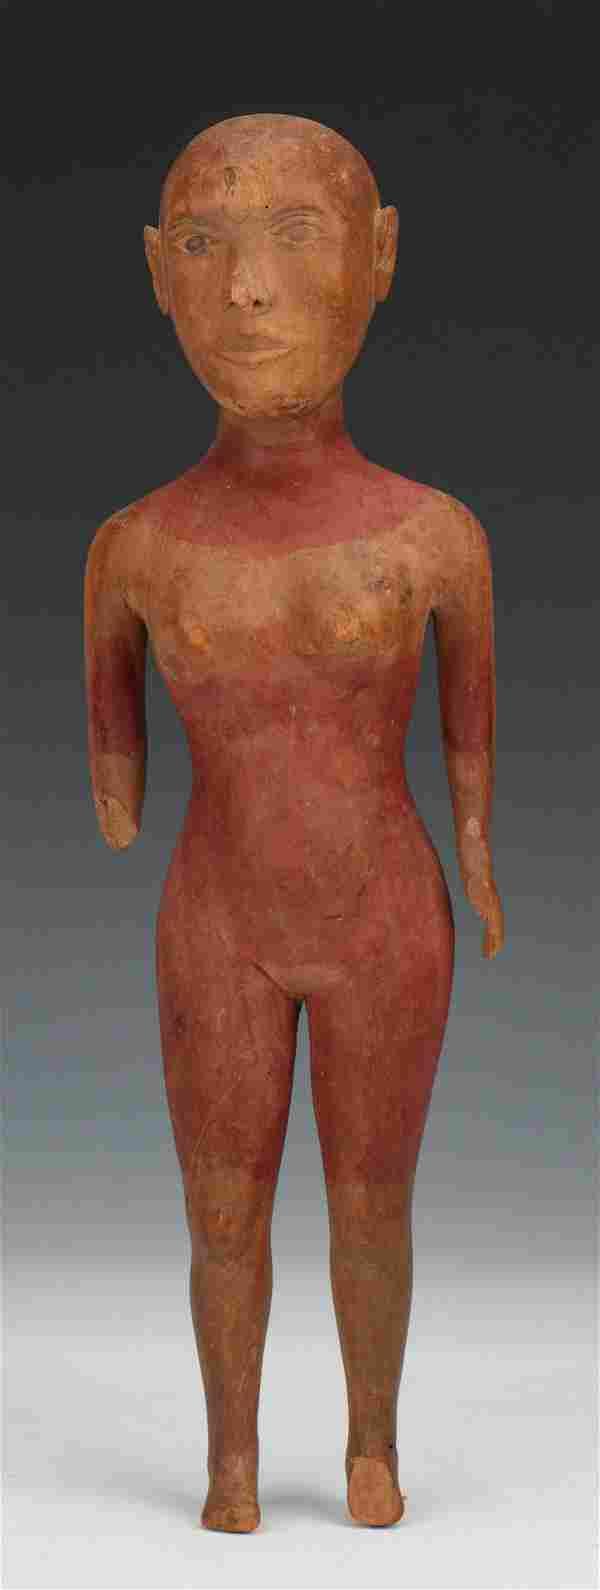 Northeastern Brazil Votive Sculpture, Early 20th C.